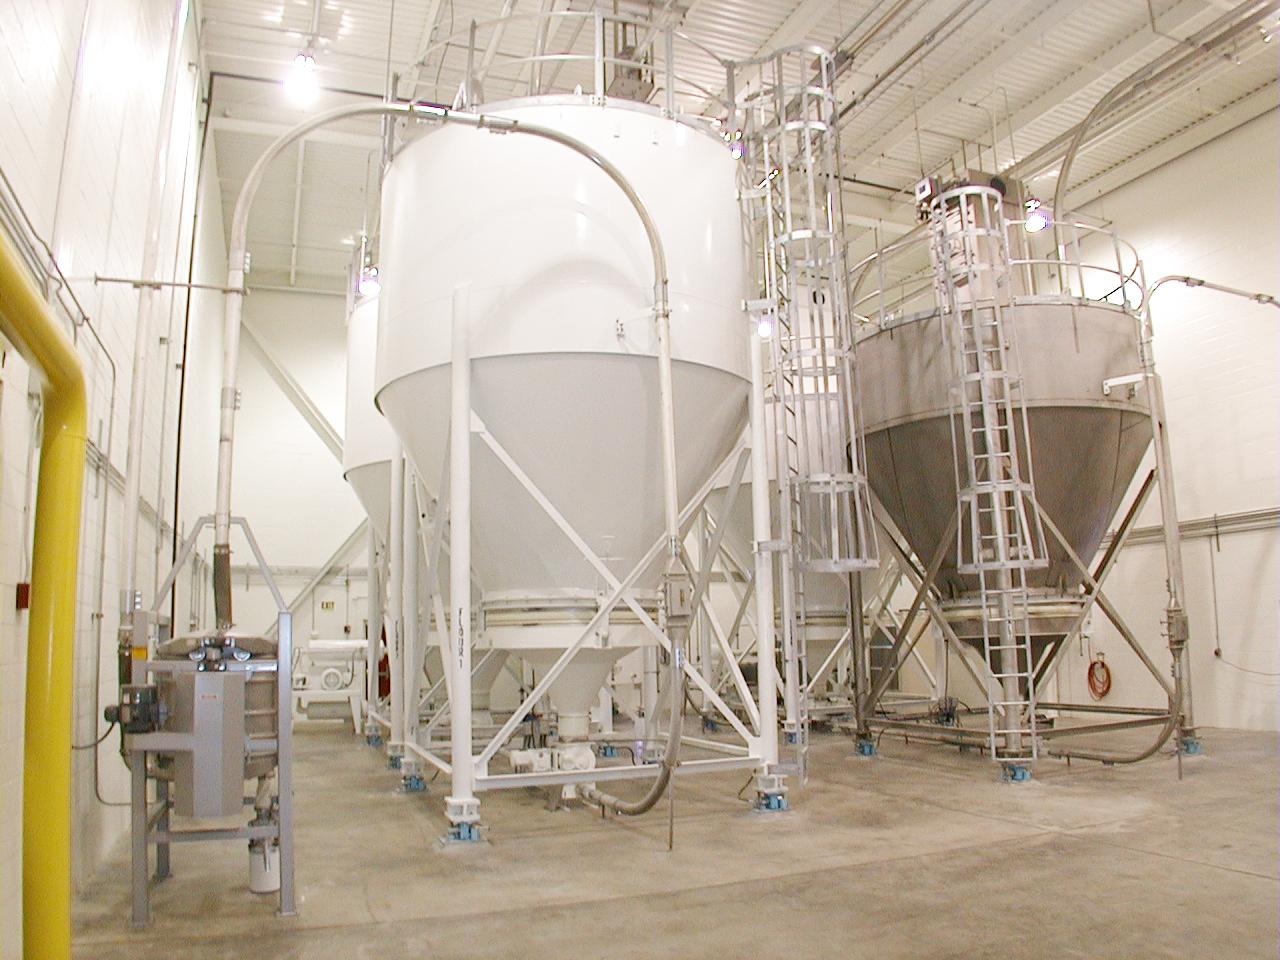 Industrial Interior 2